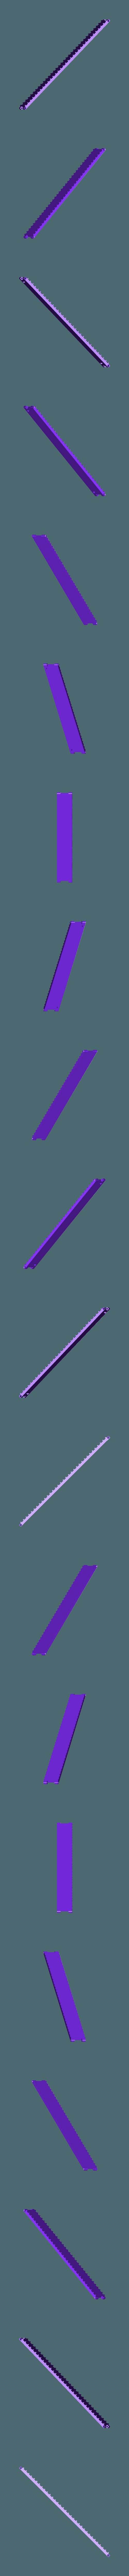 bridge rampe crans 1.6 scx24.STL Download STL file Axial SCX24 Crawler high bridge • 3D print model, lulu3Dbuilder